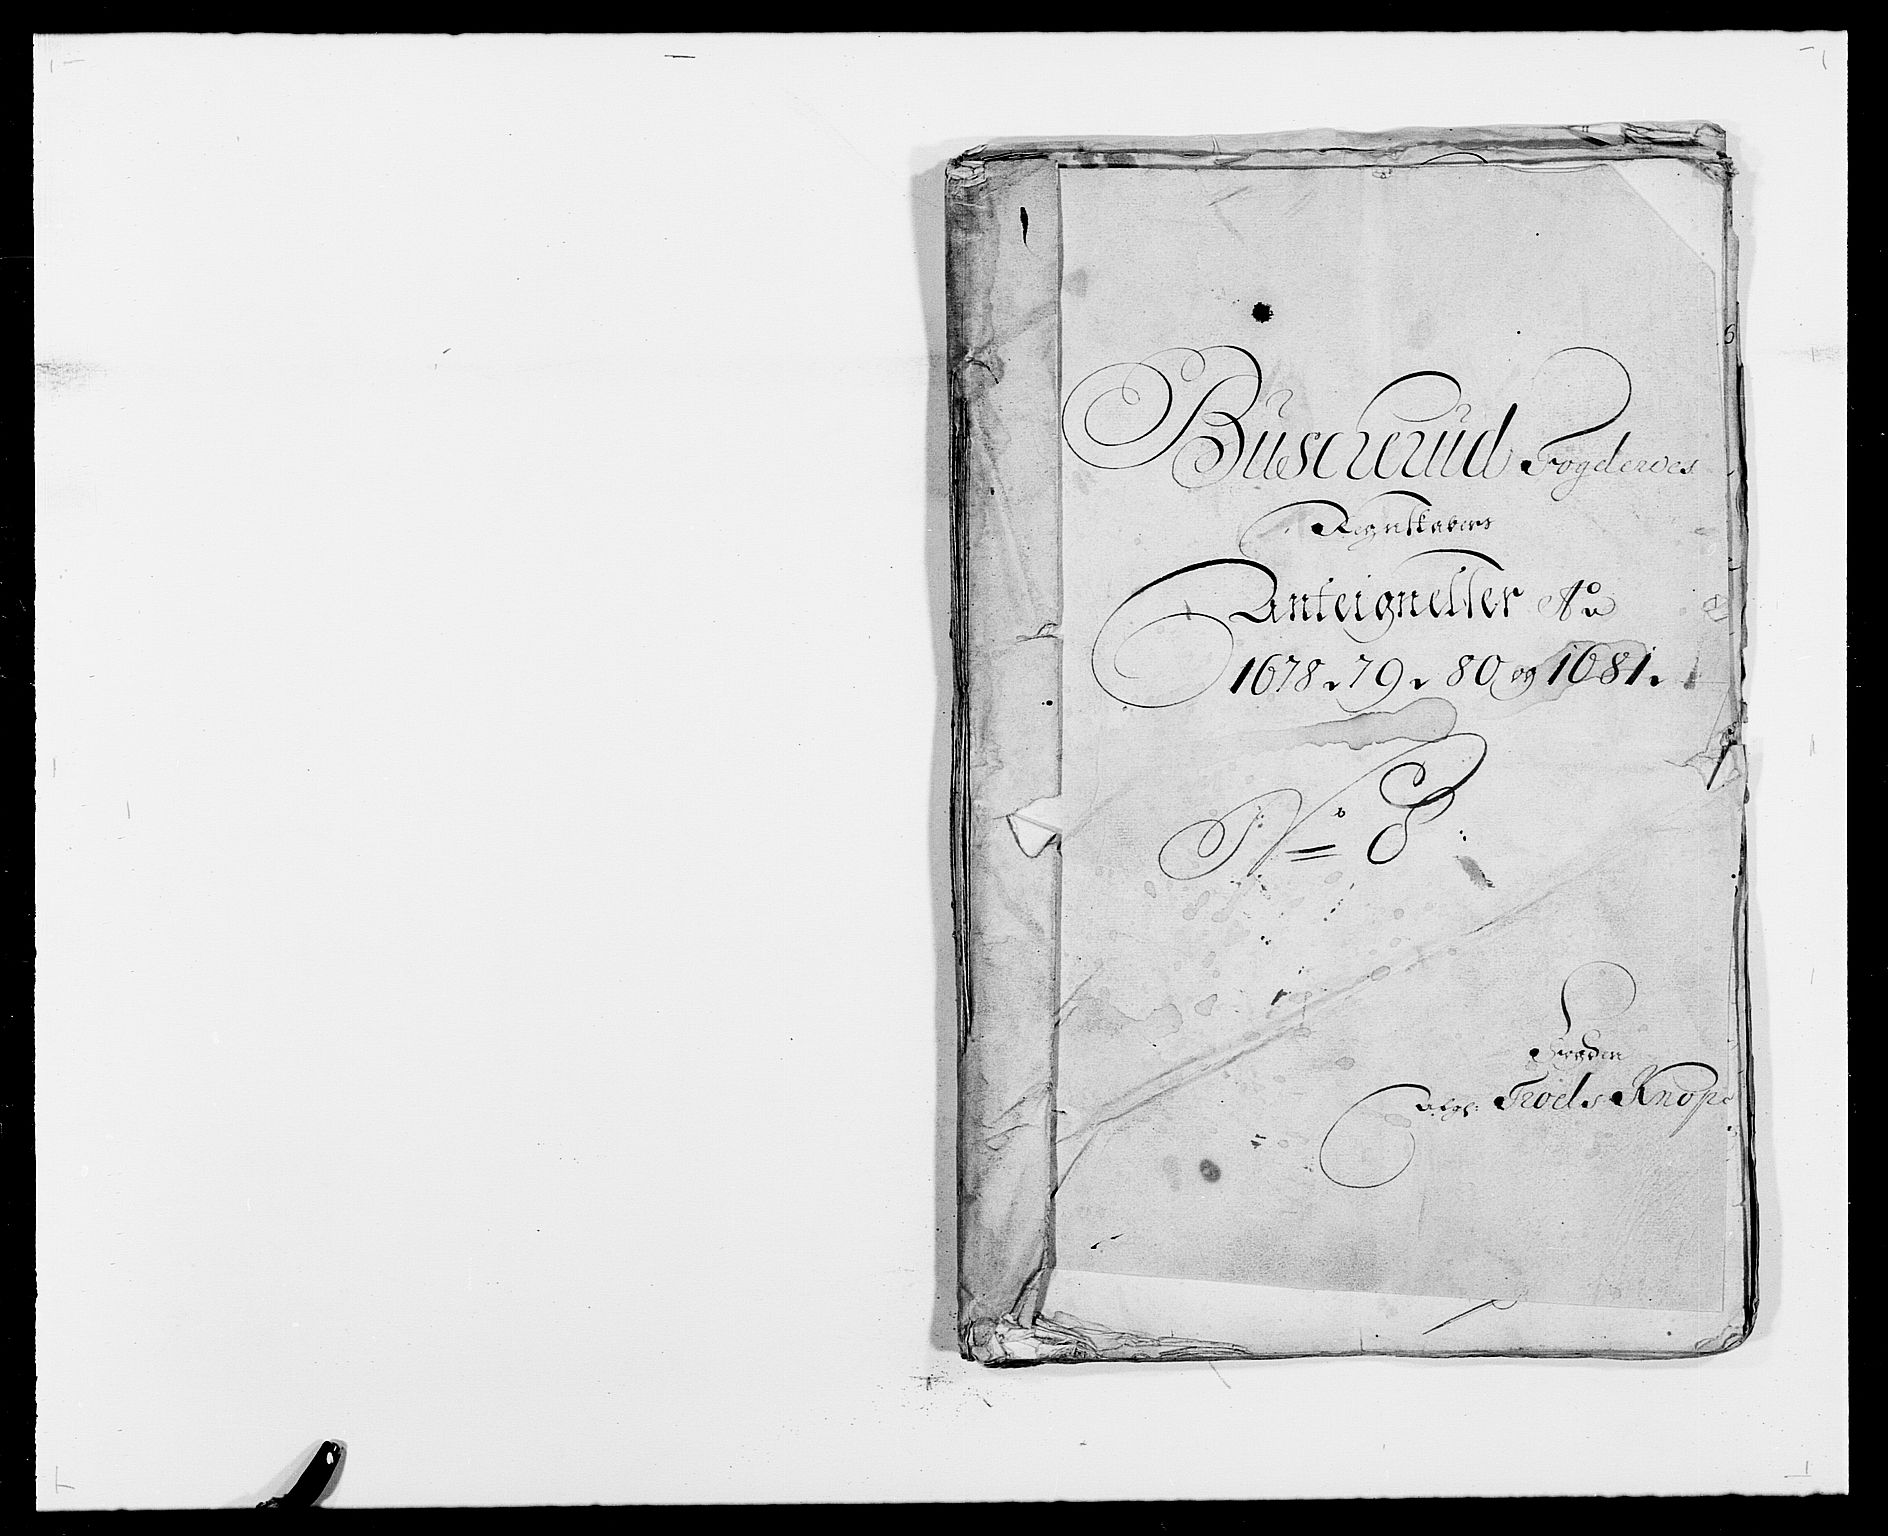 RA, Rentekammeret inntil 1814, Reviderte regnskaper, Fogderegnskap, R25/L1675: Fogderegnskap Buskerud, 1678-1681, s. 391